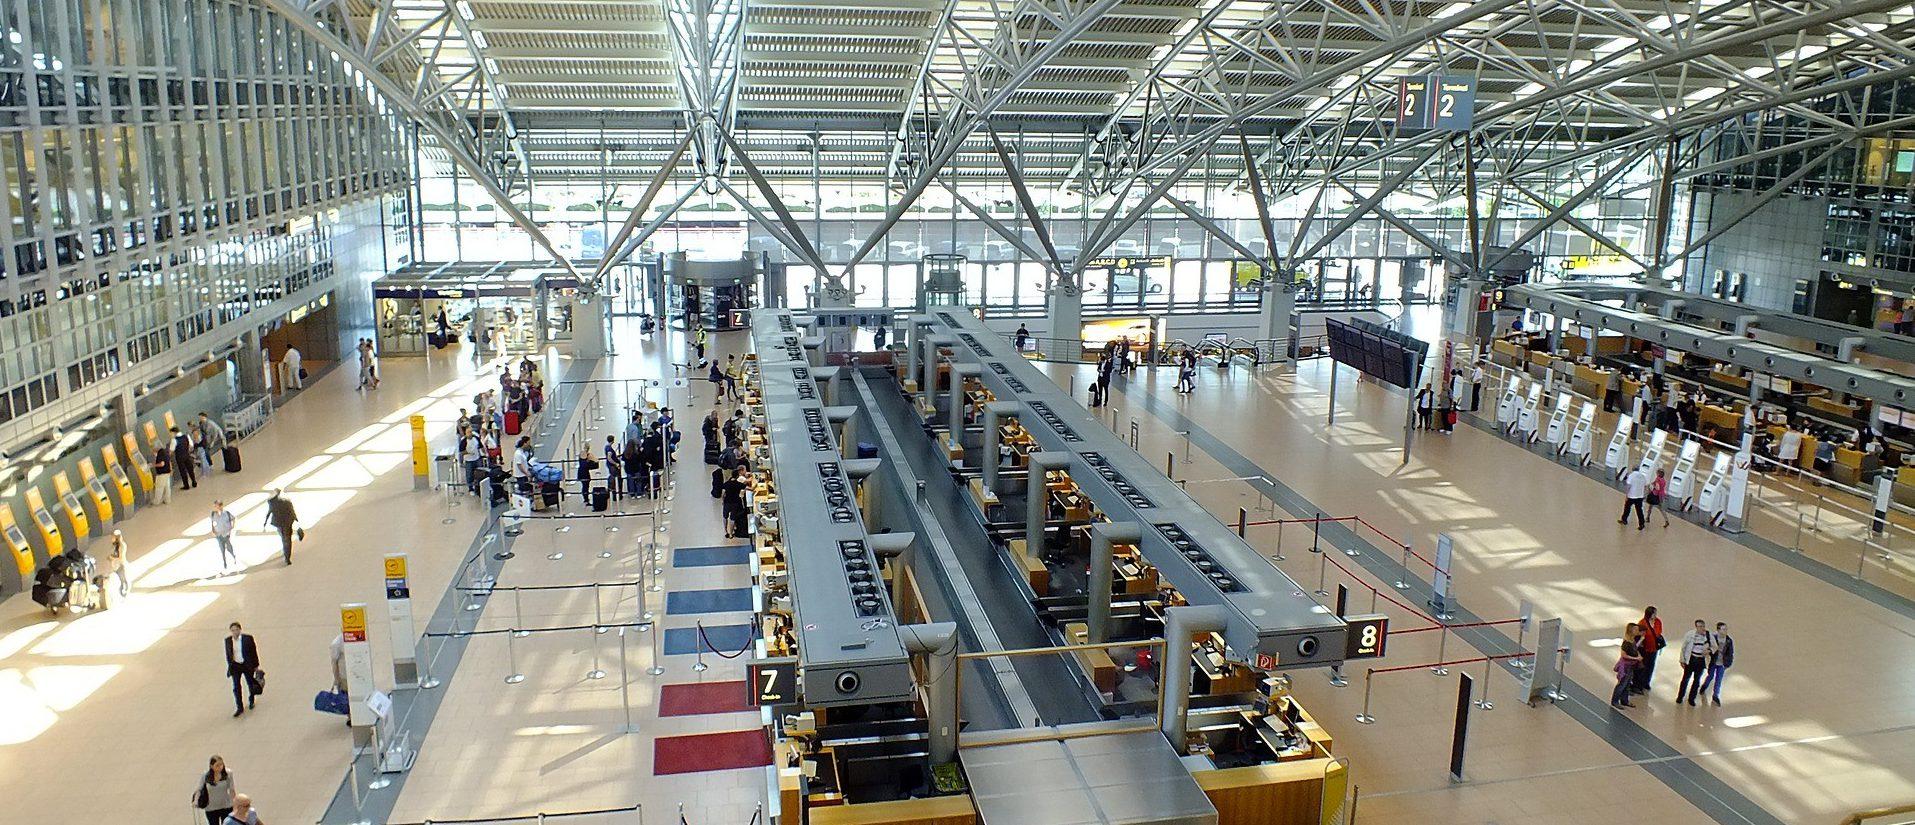 Flughafen Hamburg Ankunft Abflug Flugplan Flugzeiten